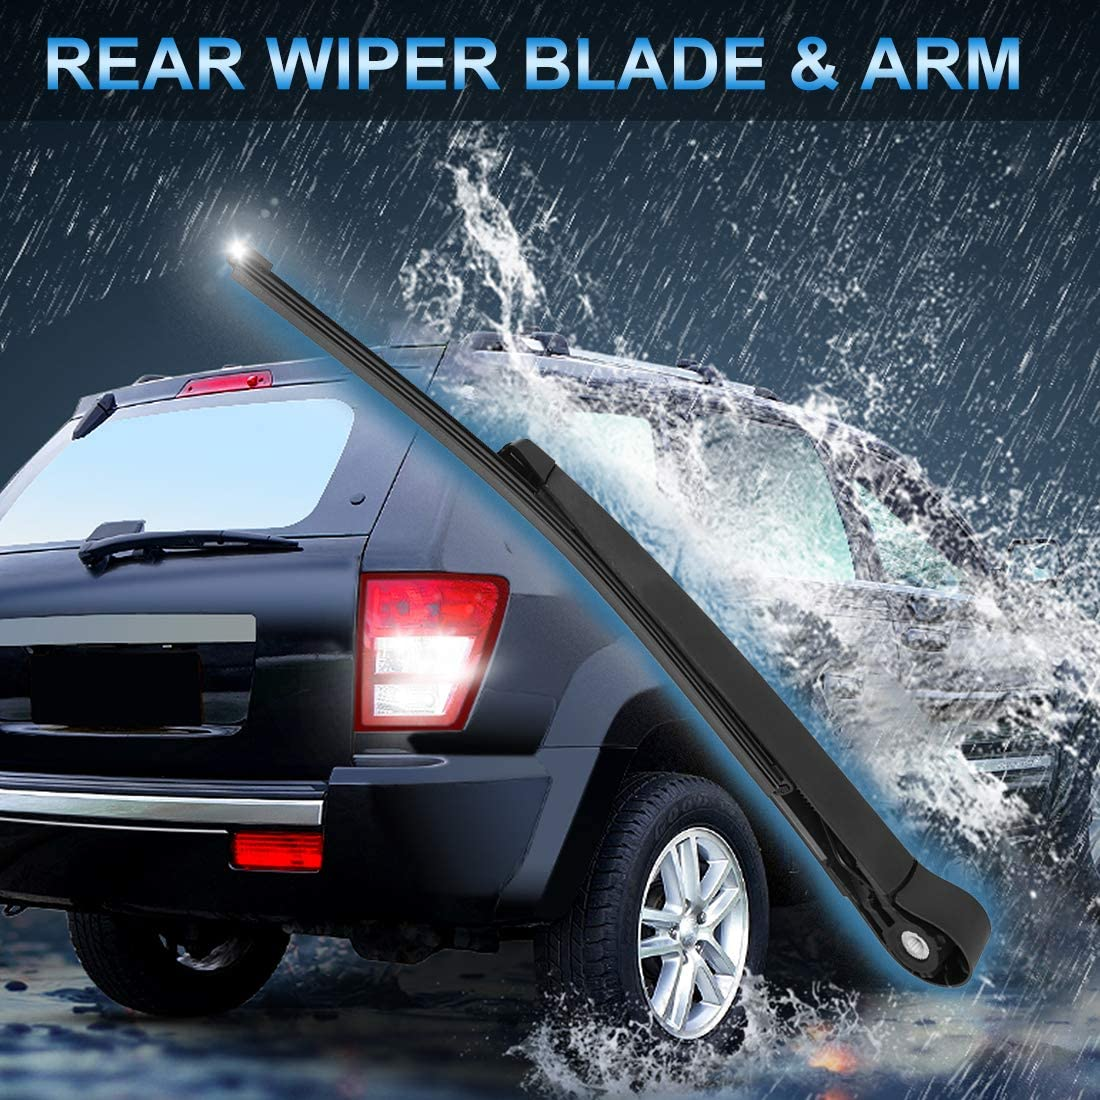 X AUTOHAUX Rear Windshield Wiper Blade Arm Set 300mm Fit for Borgward BX7 2016 2017 2018 2019